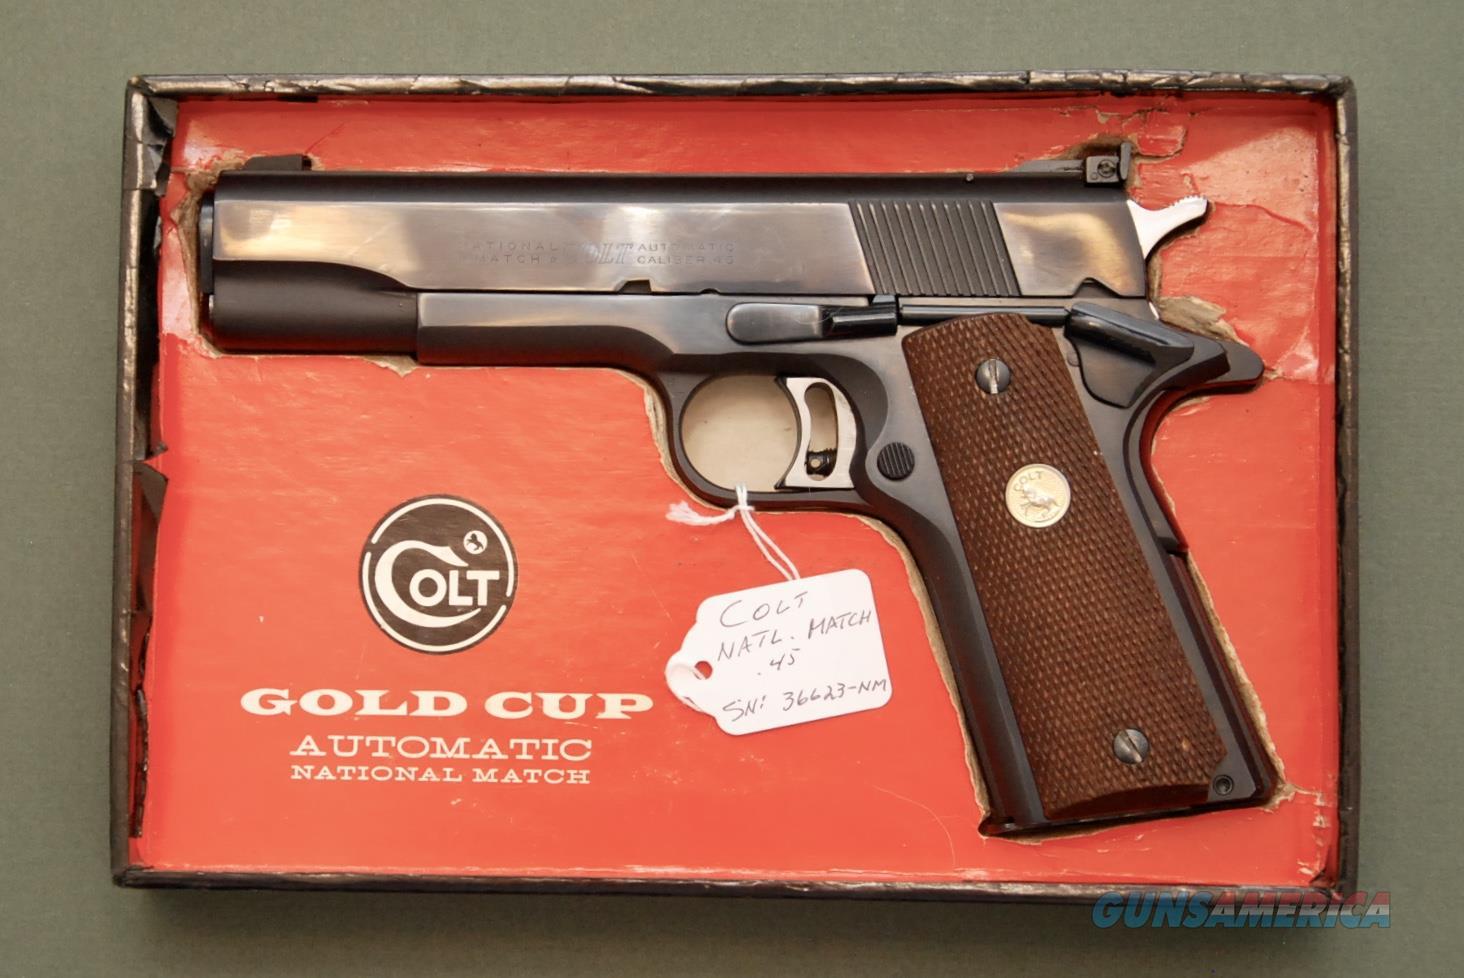 Colt Pre-Series 70 National Match in Box .45 ACP  Guns > Pistols > Colt Automatic Pistols (1911 & Var)